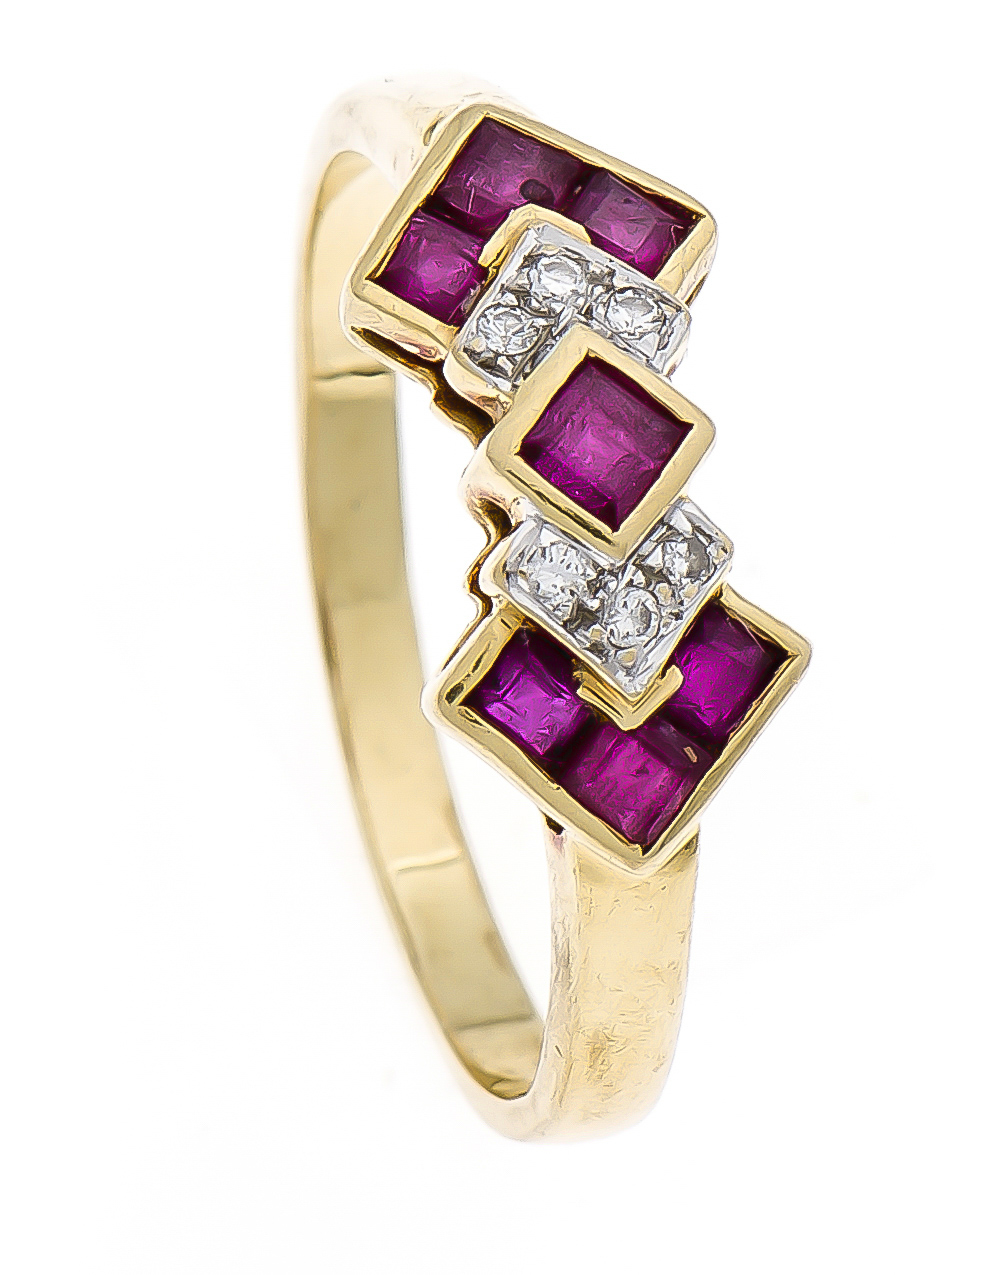 Rubin-Brillant-Ring GG/WG 750/000 mit fac